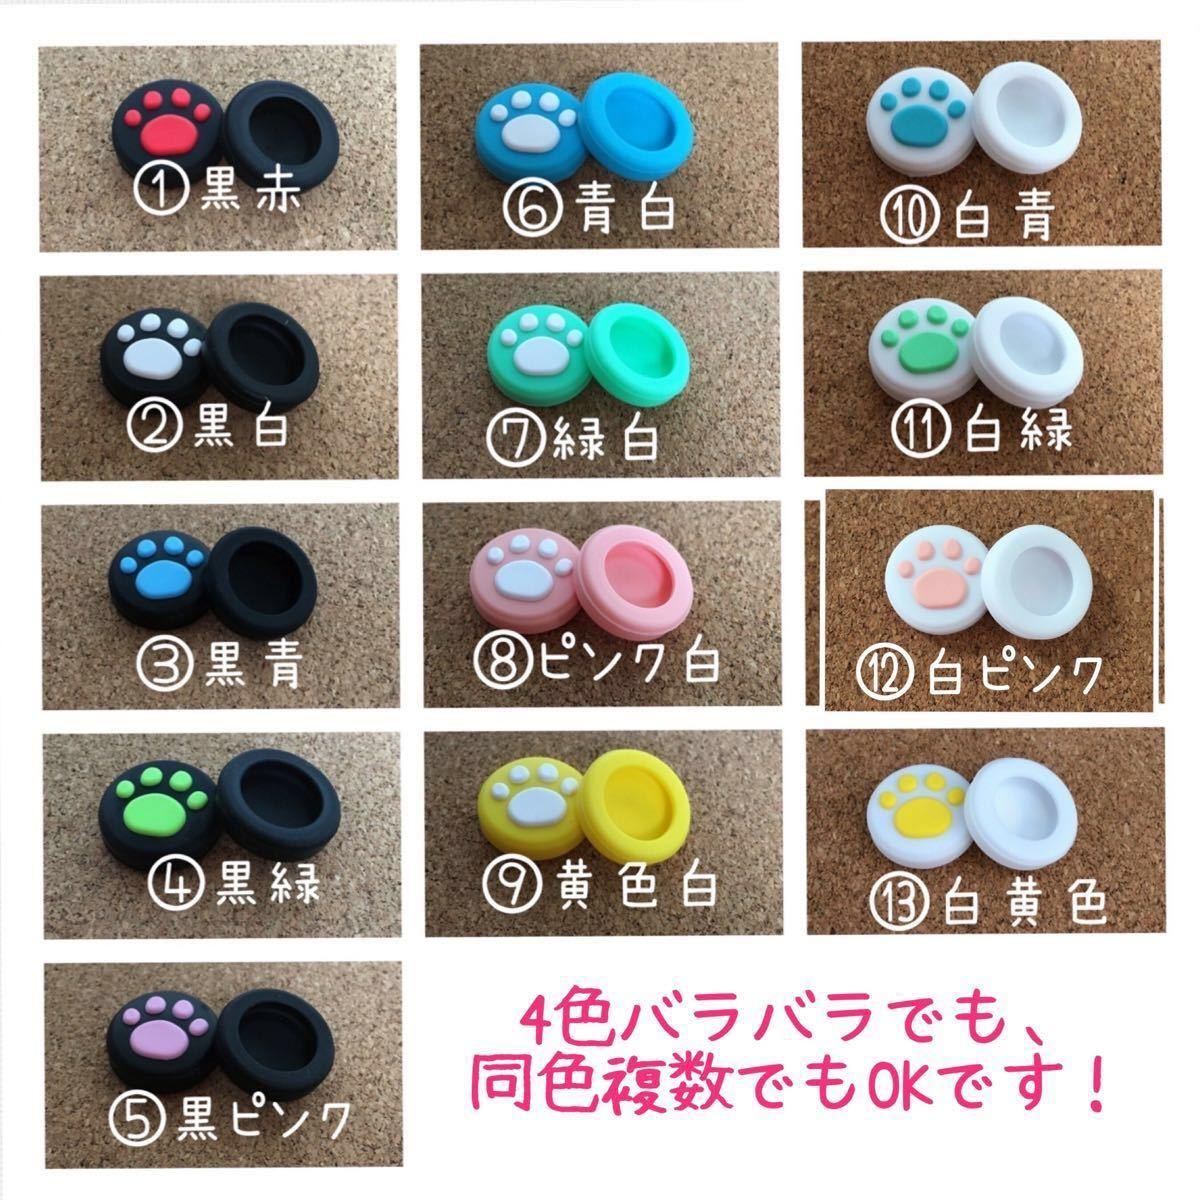 Nintendo Switch スイッチ ジョイコン スティックカバー 肉球 6個セット 色の組み合わせ自由